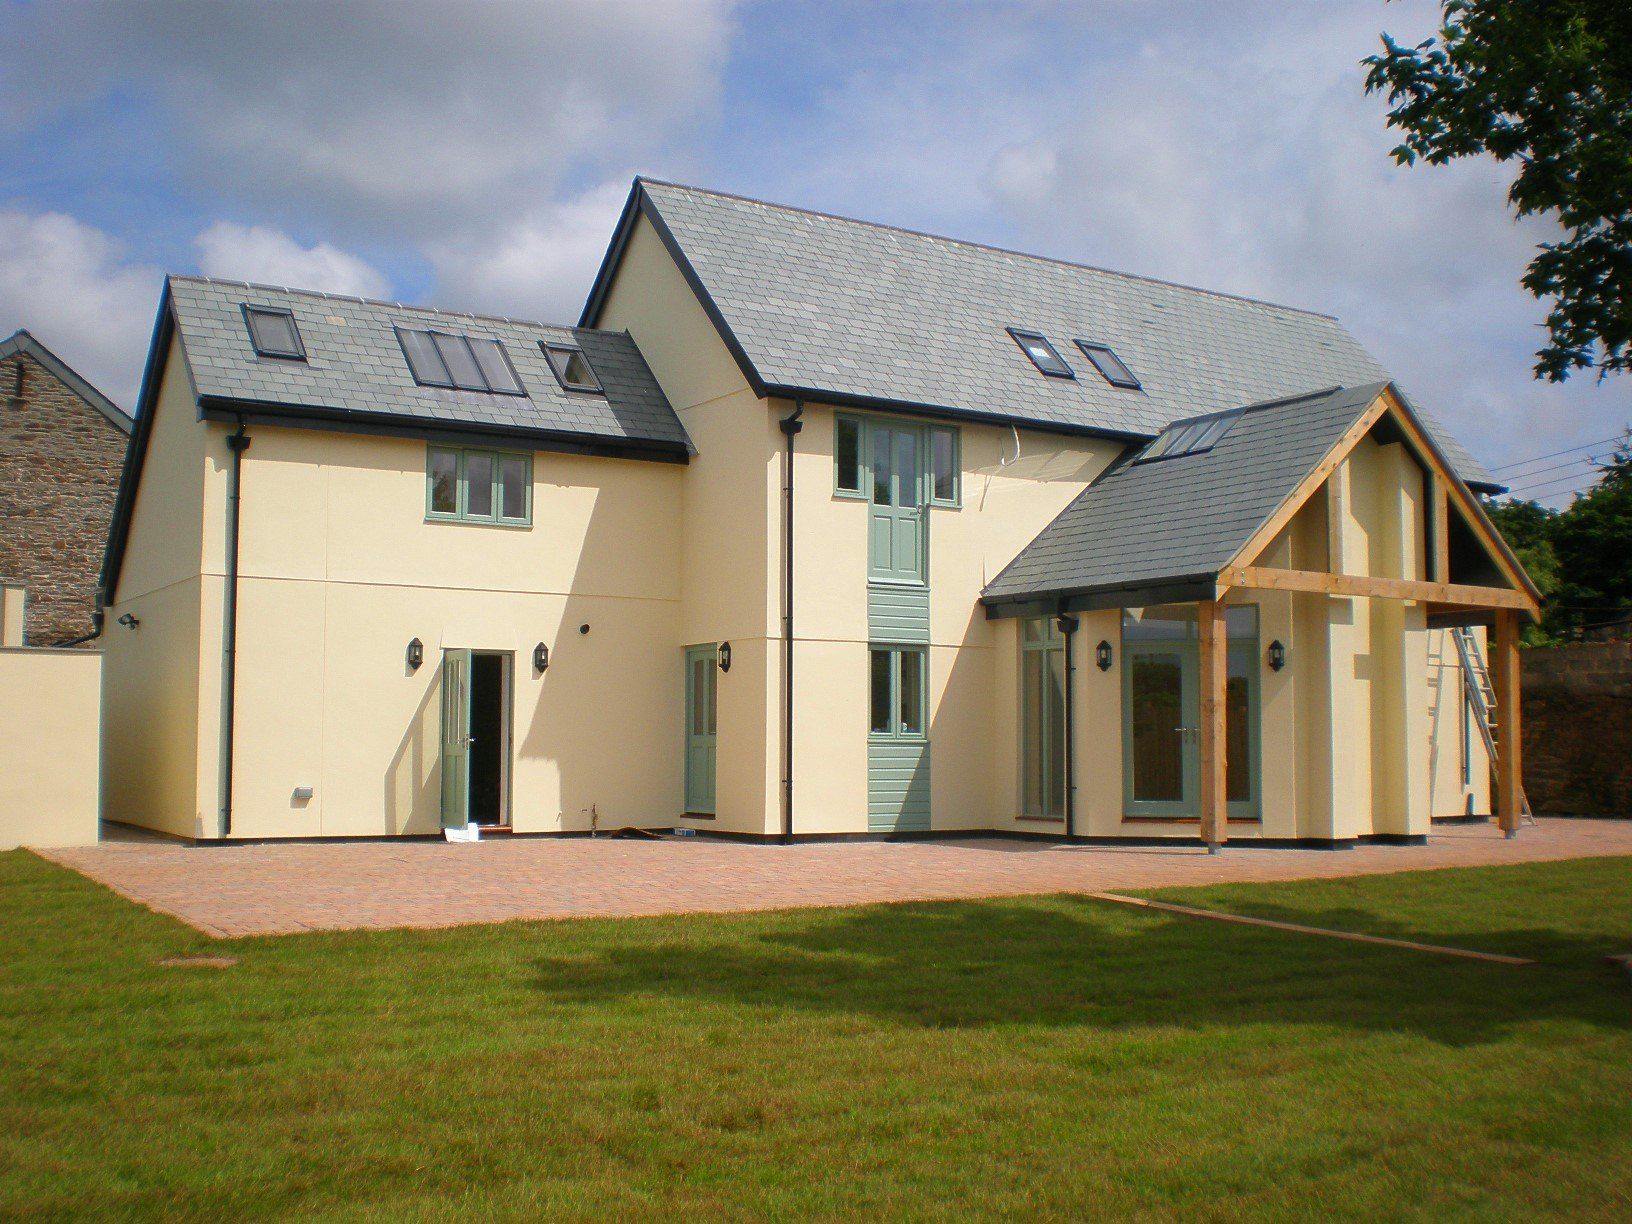 Barn Conversion new house next to refurbished barn